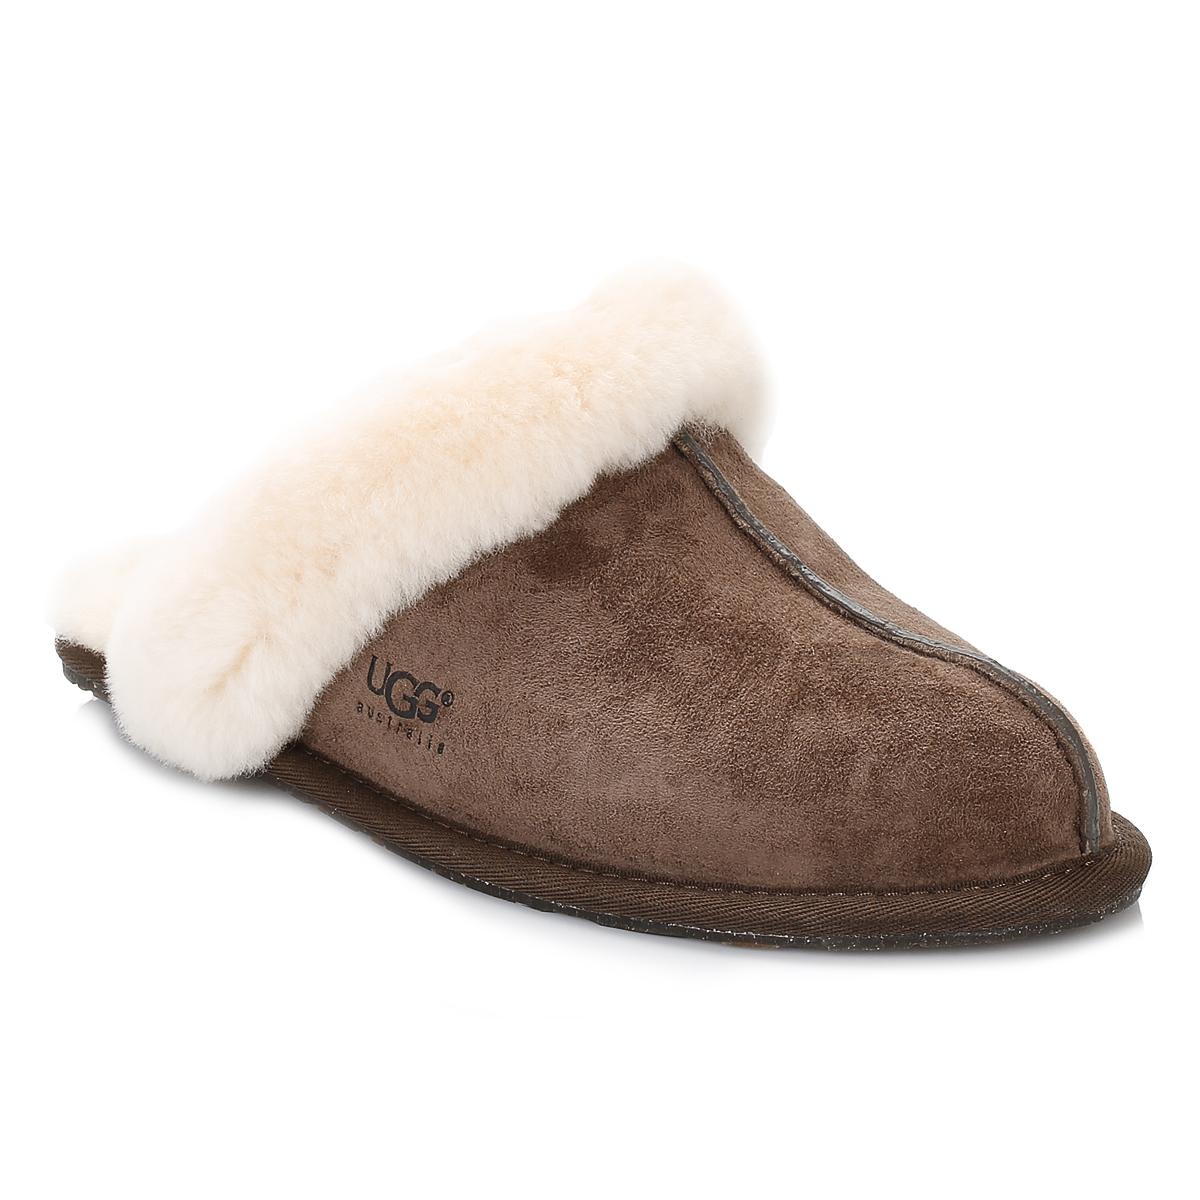 77812995c756 UGG UGG Scuffette Ii Womens Espresso Brown Sheepskin Slippers in ...